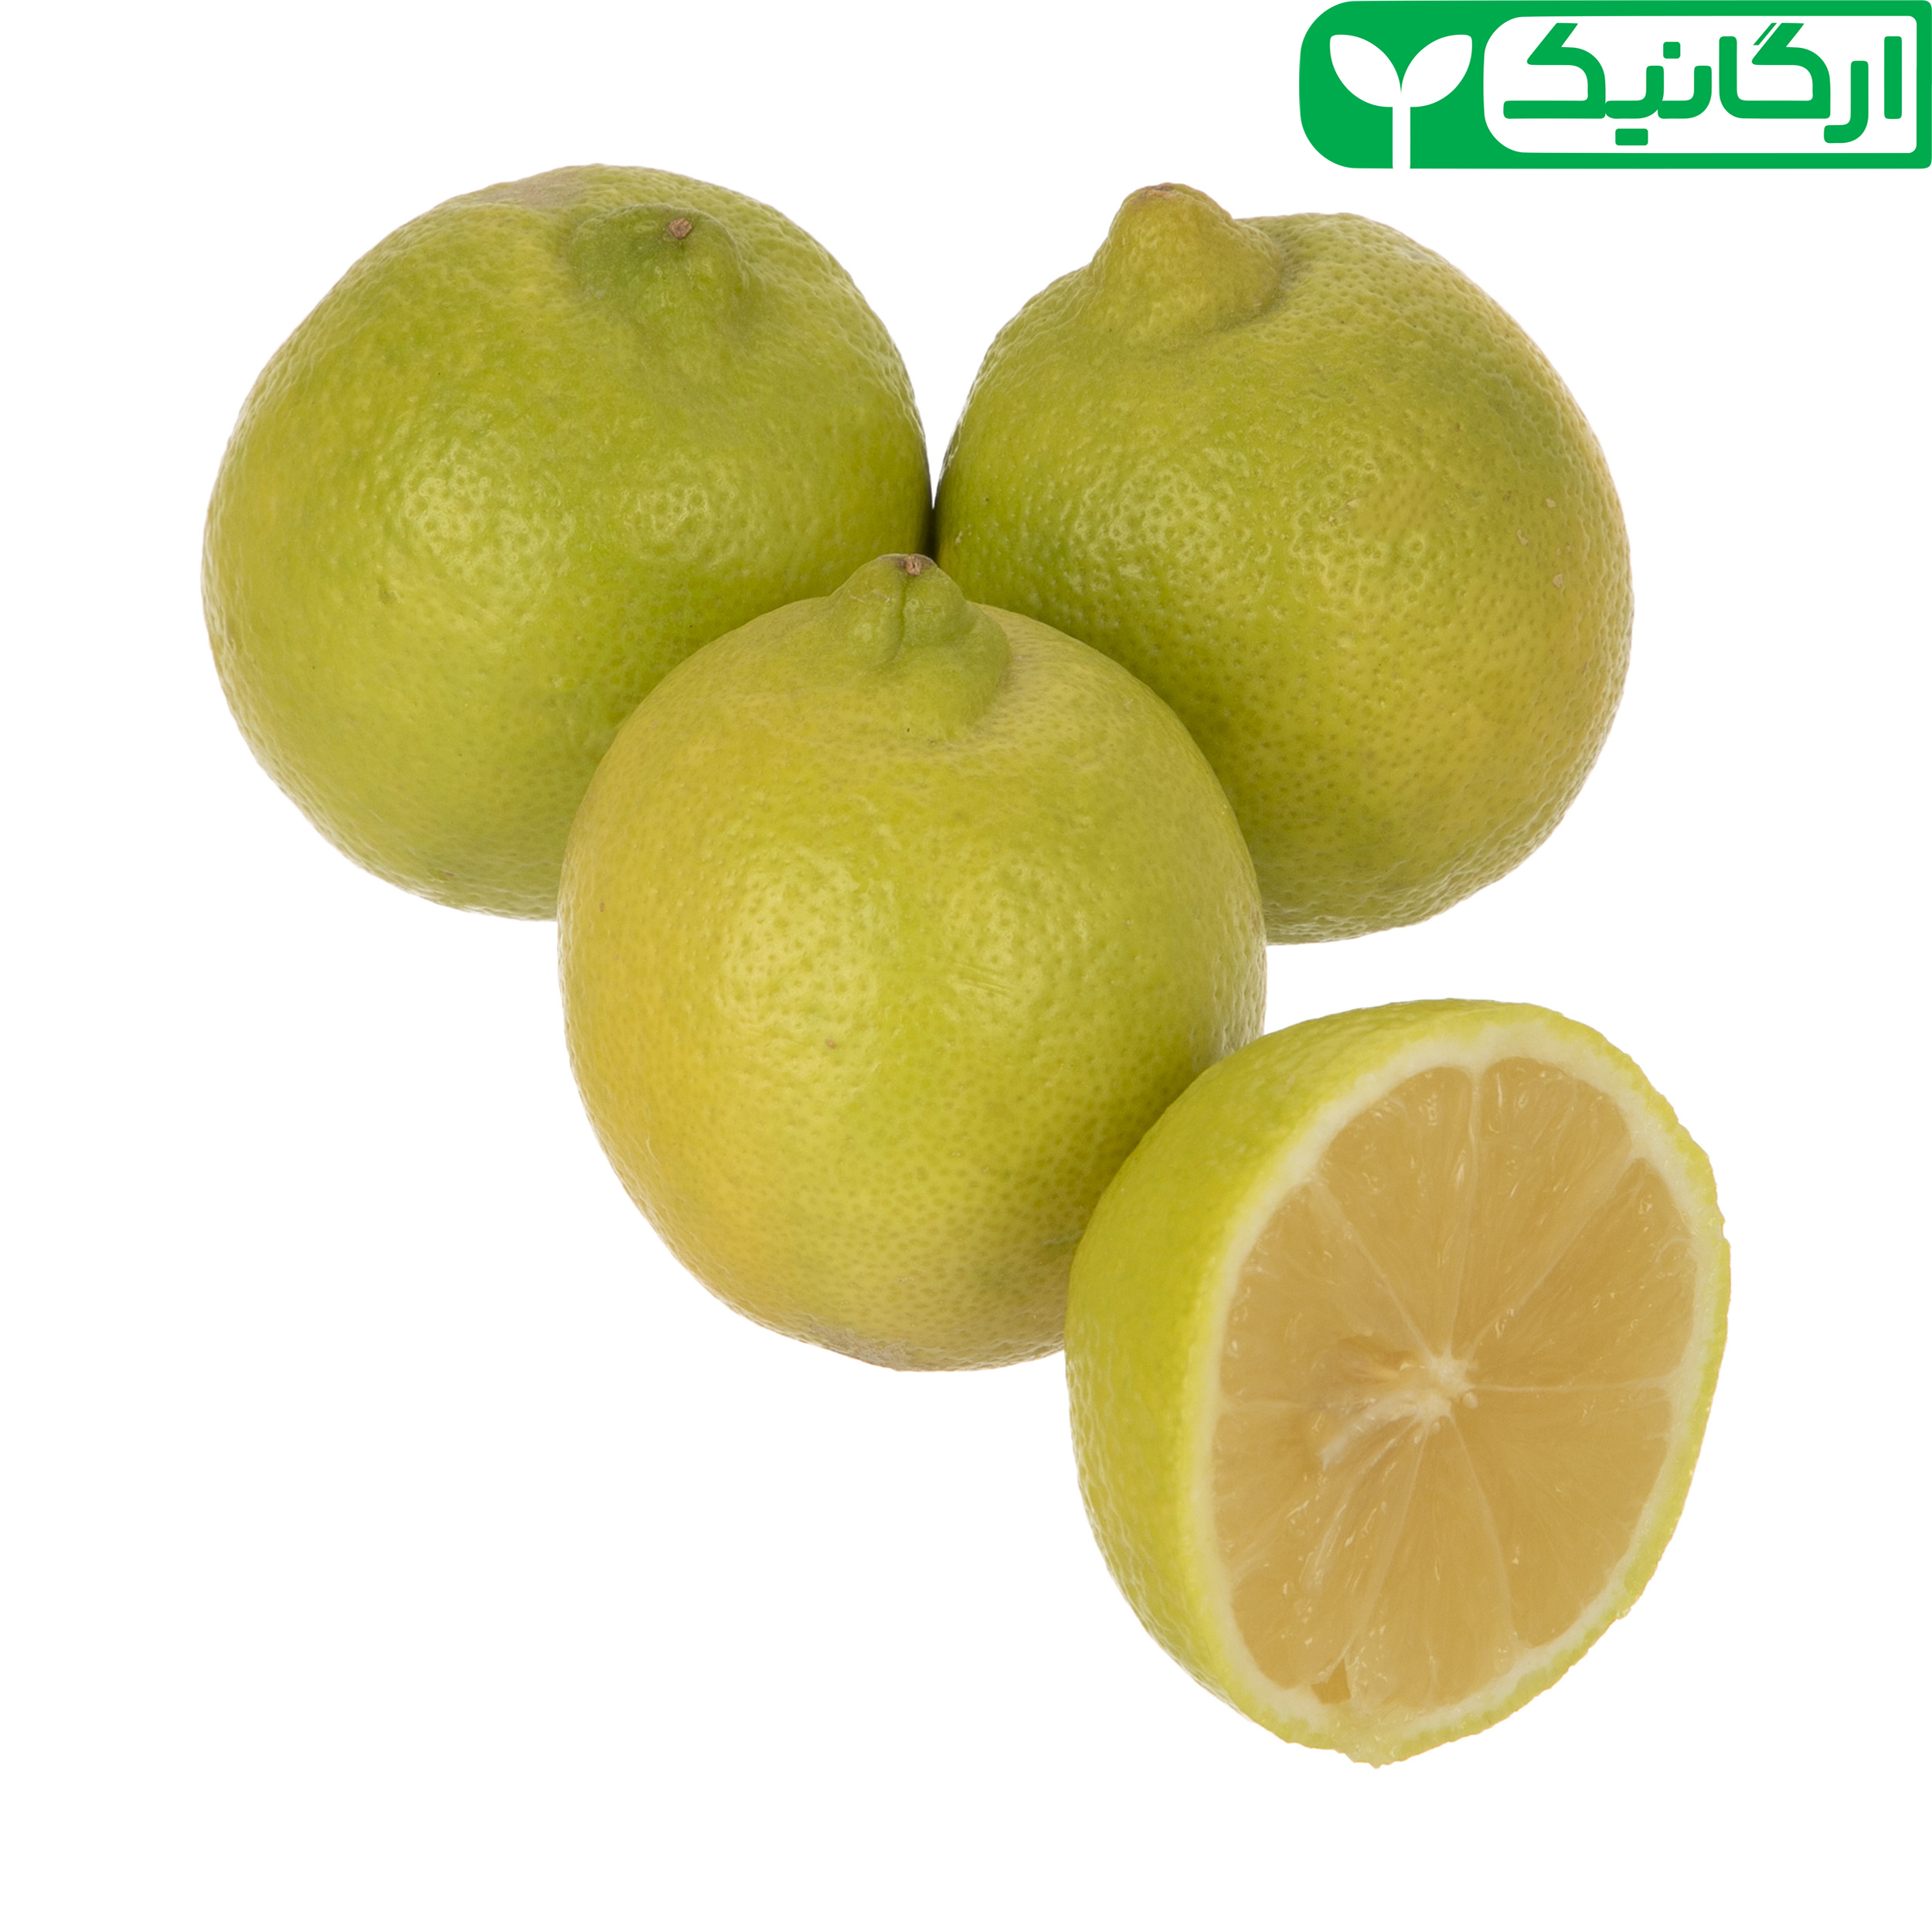 لیمو ترش ارگانیک رضوانی - 500 گرم